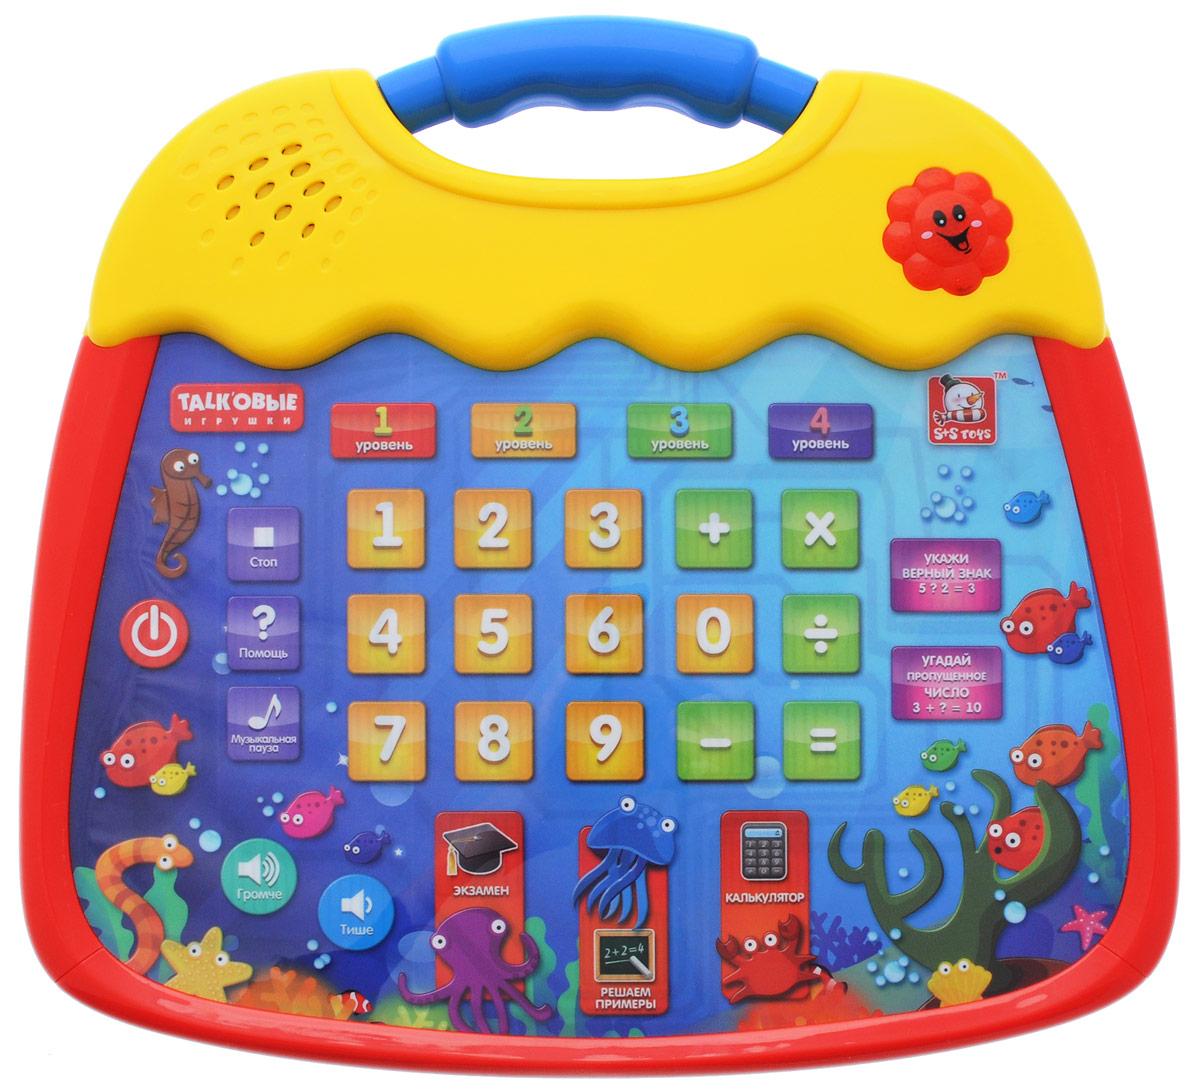 S+S Toys Интерактивный планшет Веселые цифры, Essa Toys Trading Co